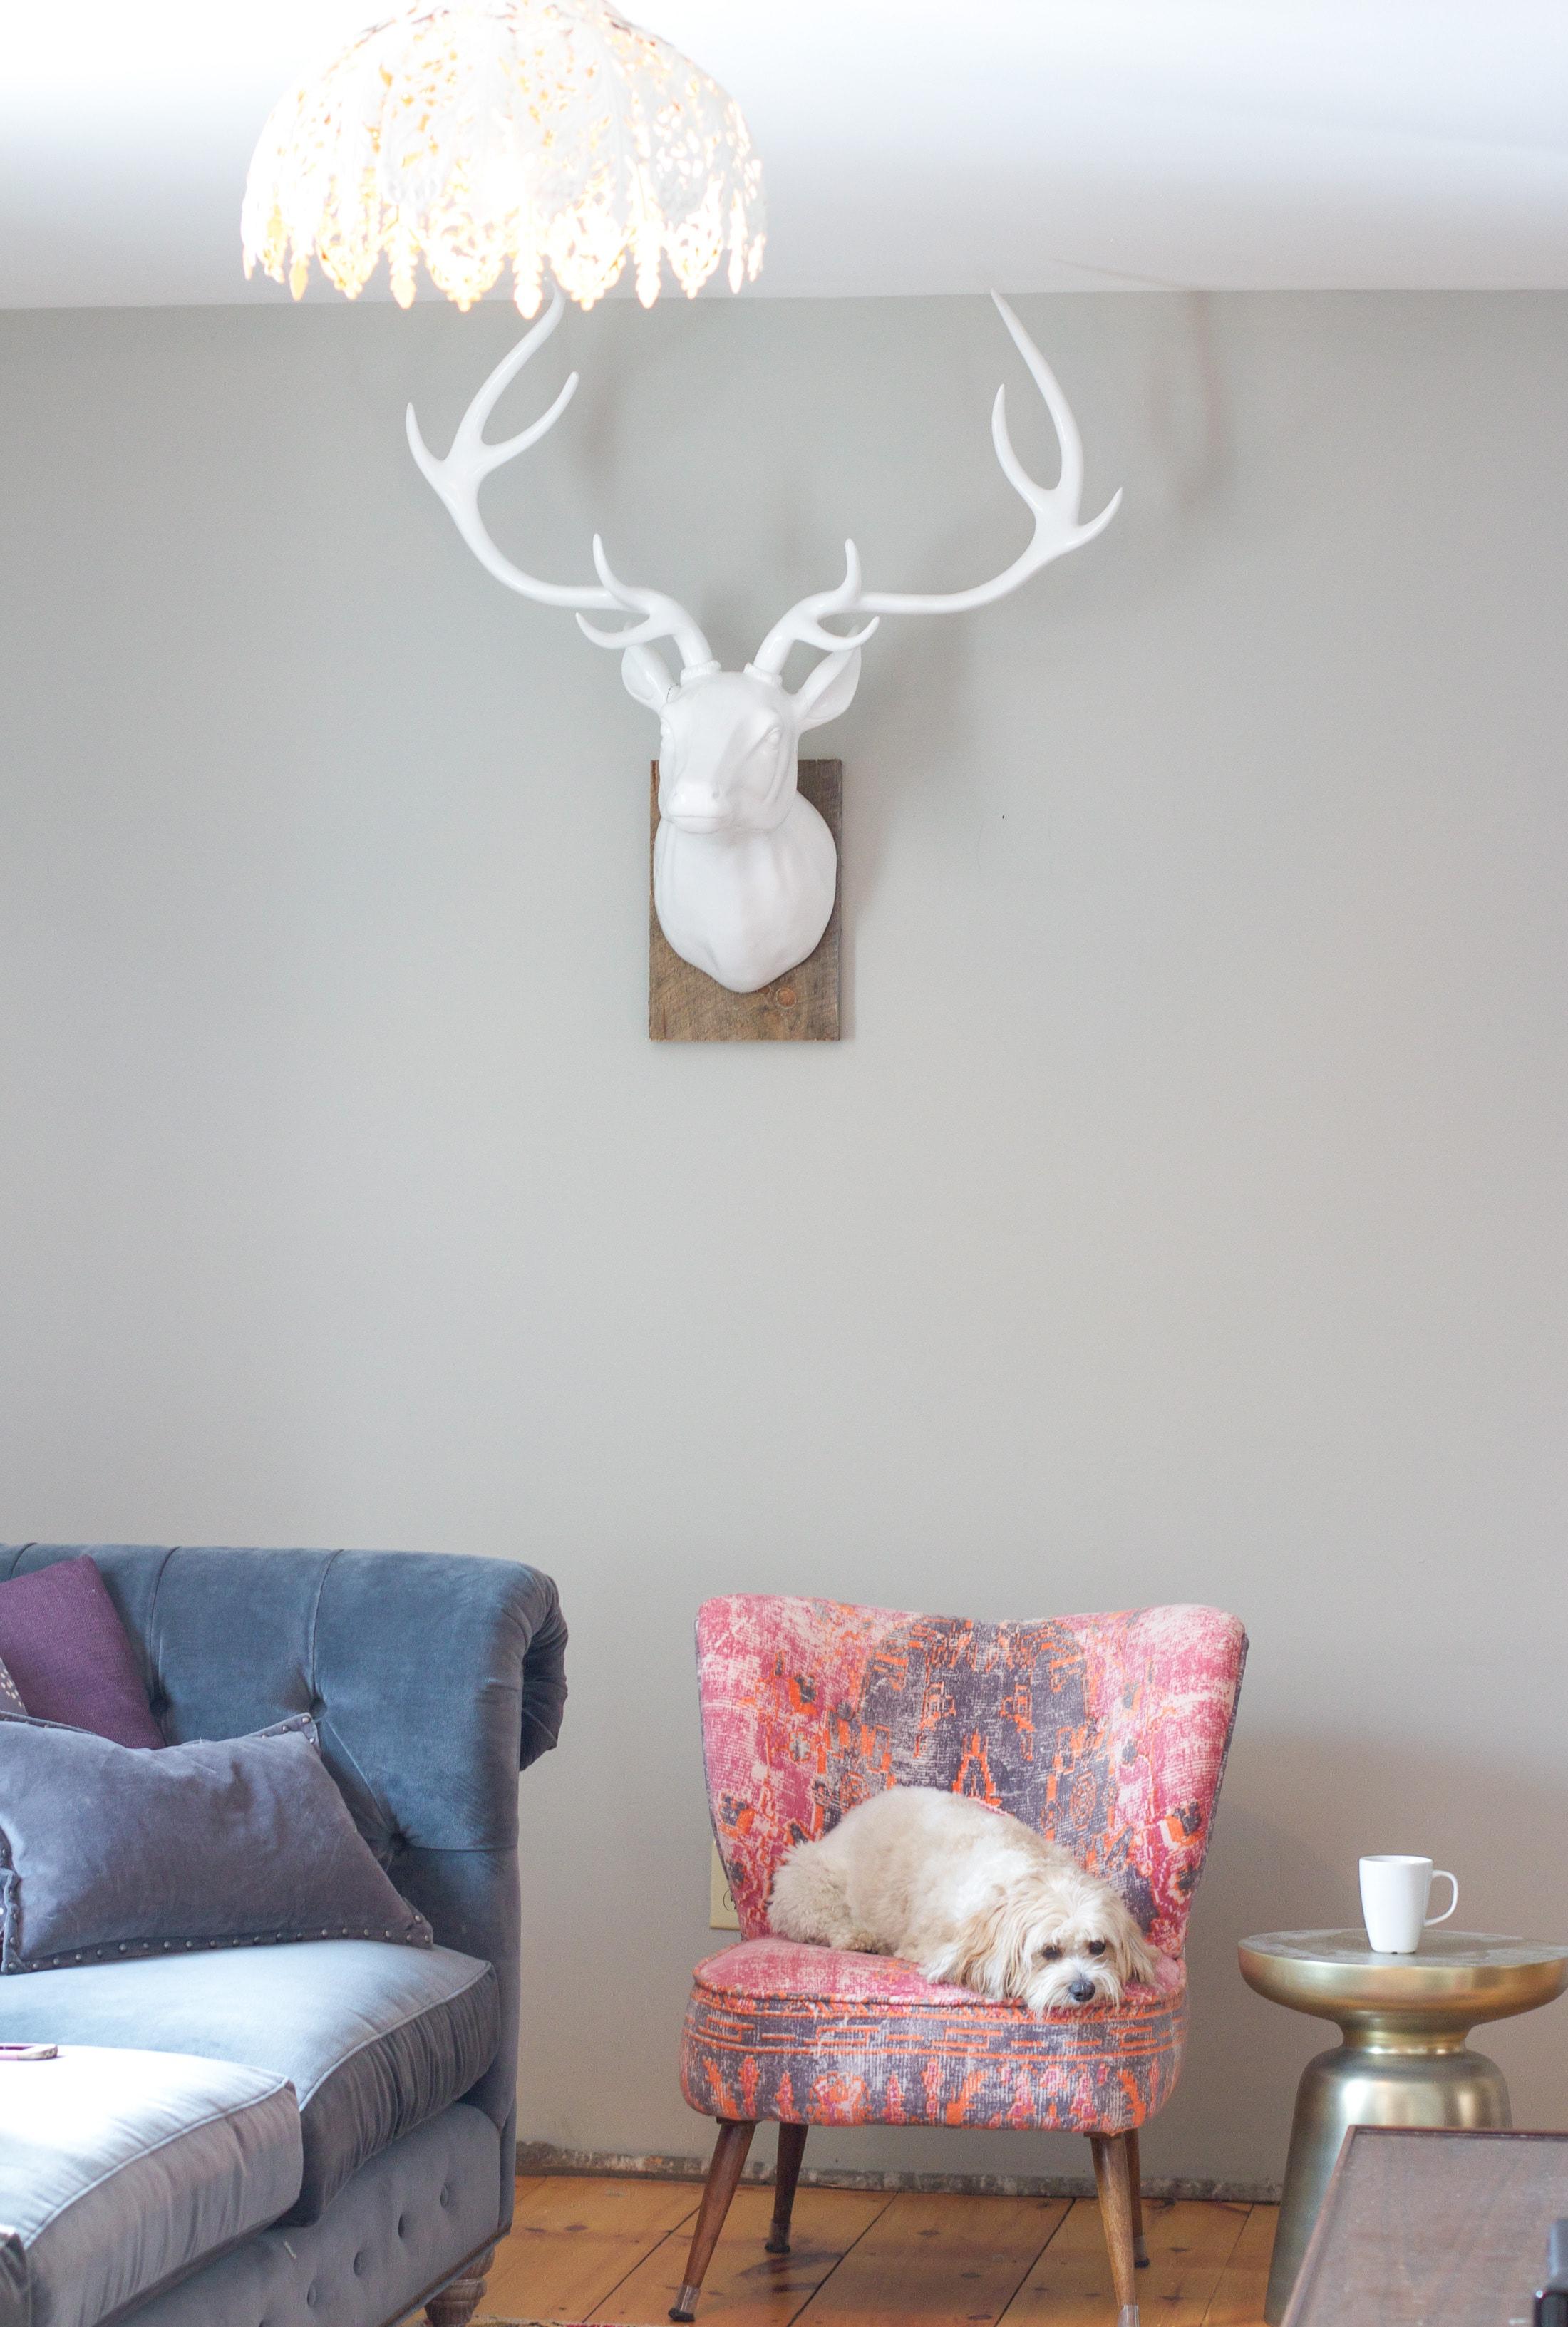 interios decor, ski house decor